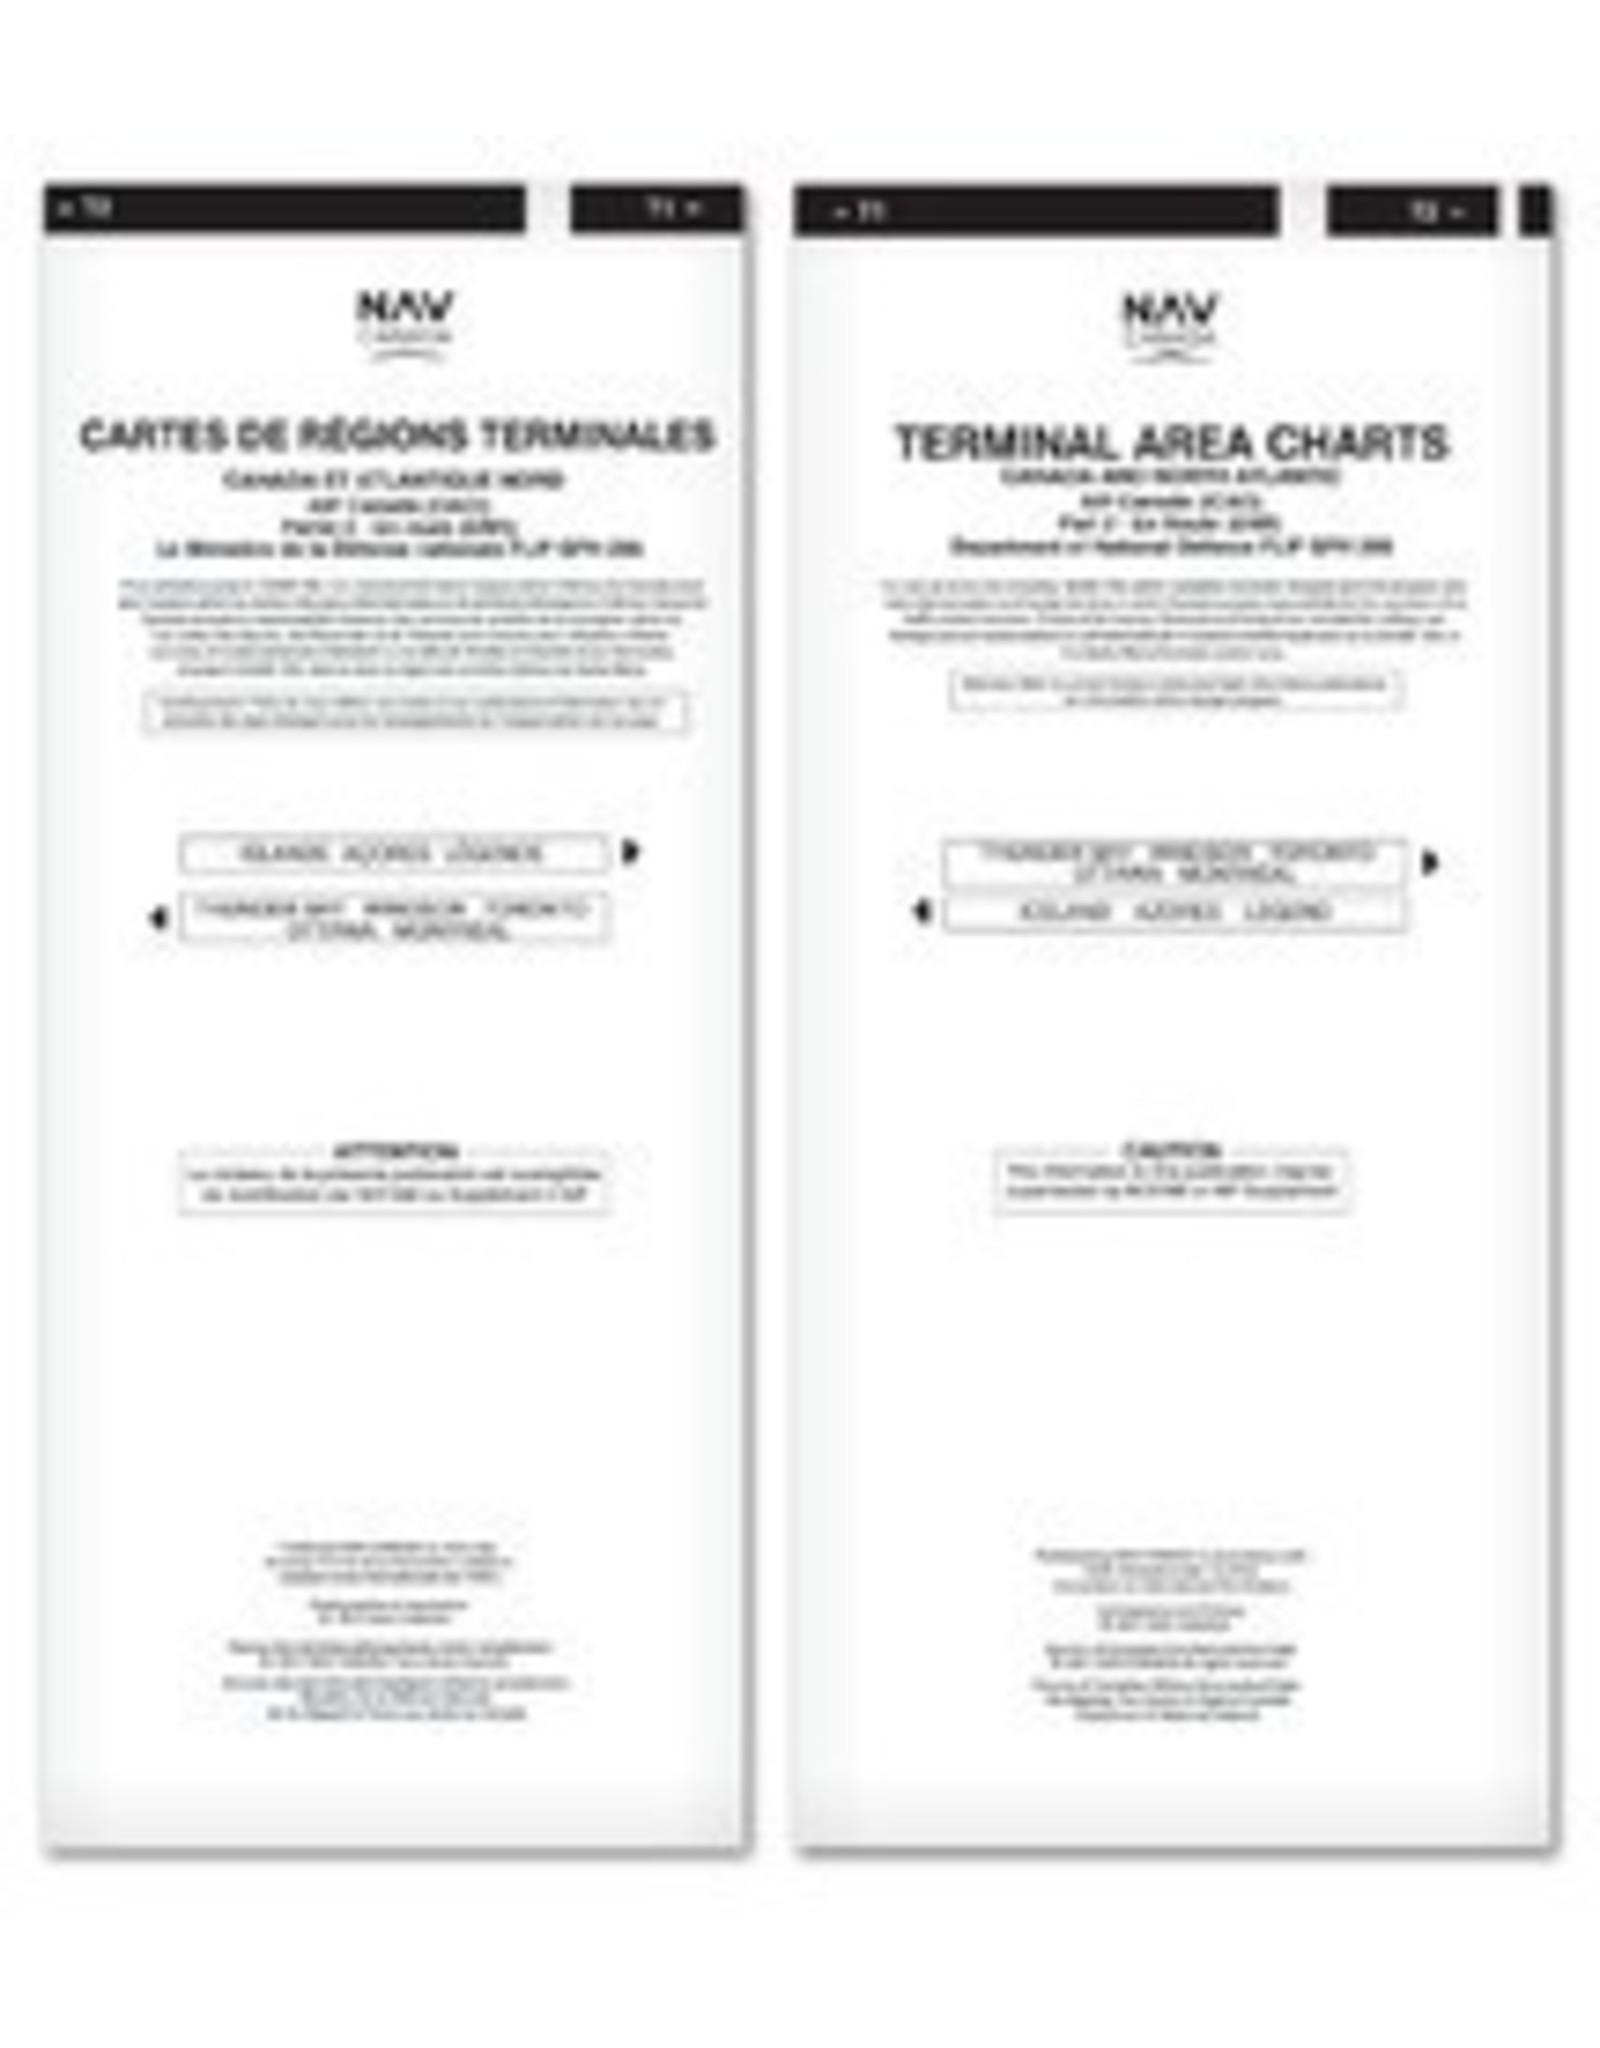 T 1/2 IFR Terminal Area Chart - Apr 22, 21 to Jun 17, 21